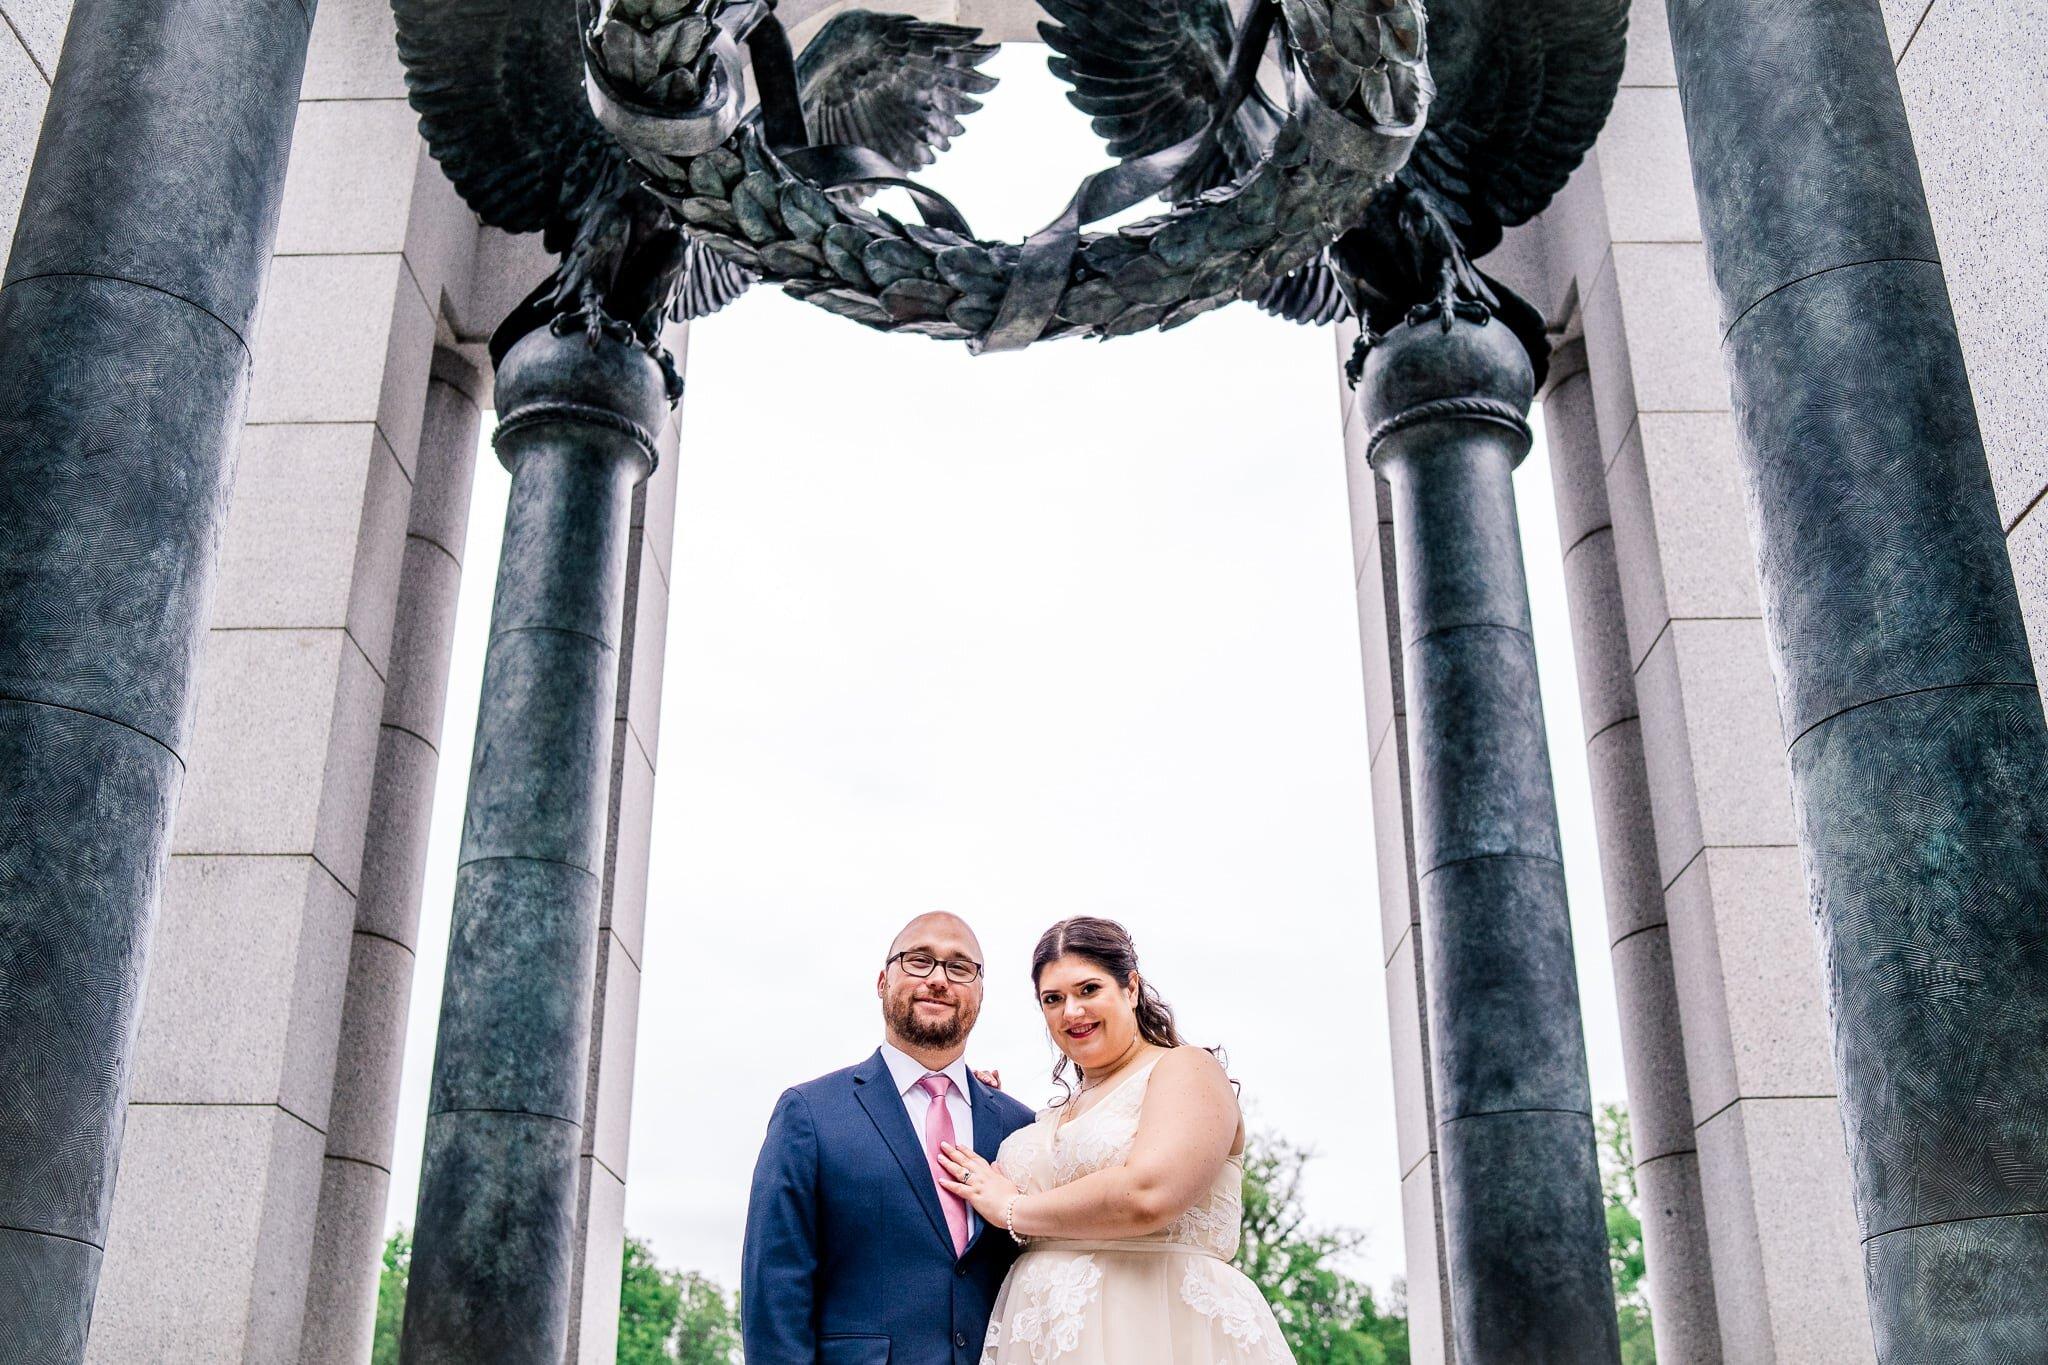 beauty-of-the-soul-studio-washington-dc-wedding-portraits-elopement-summer-2019-kristine-gaetan-23.jpg